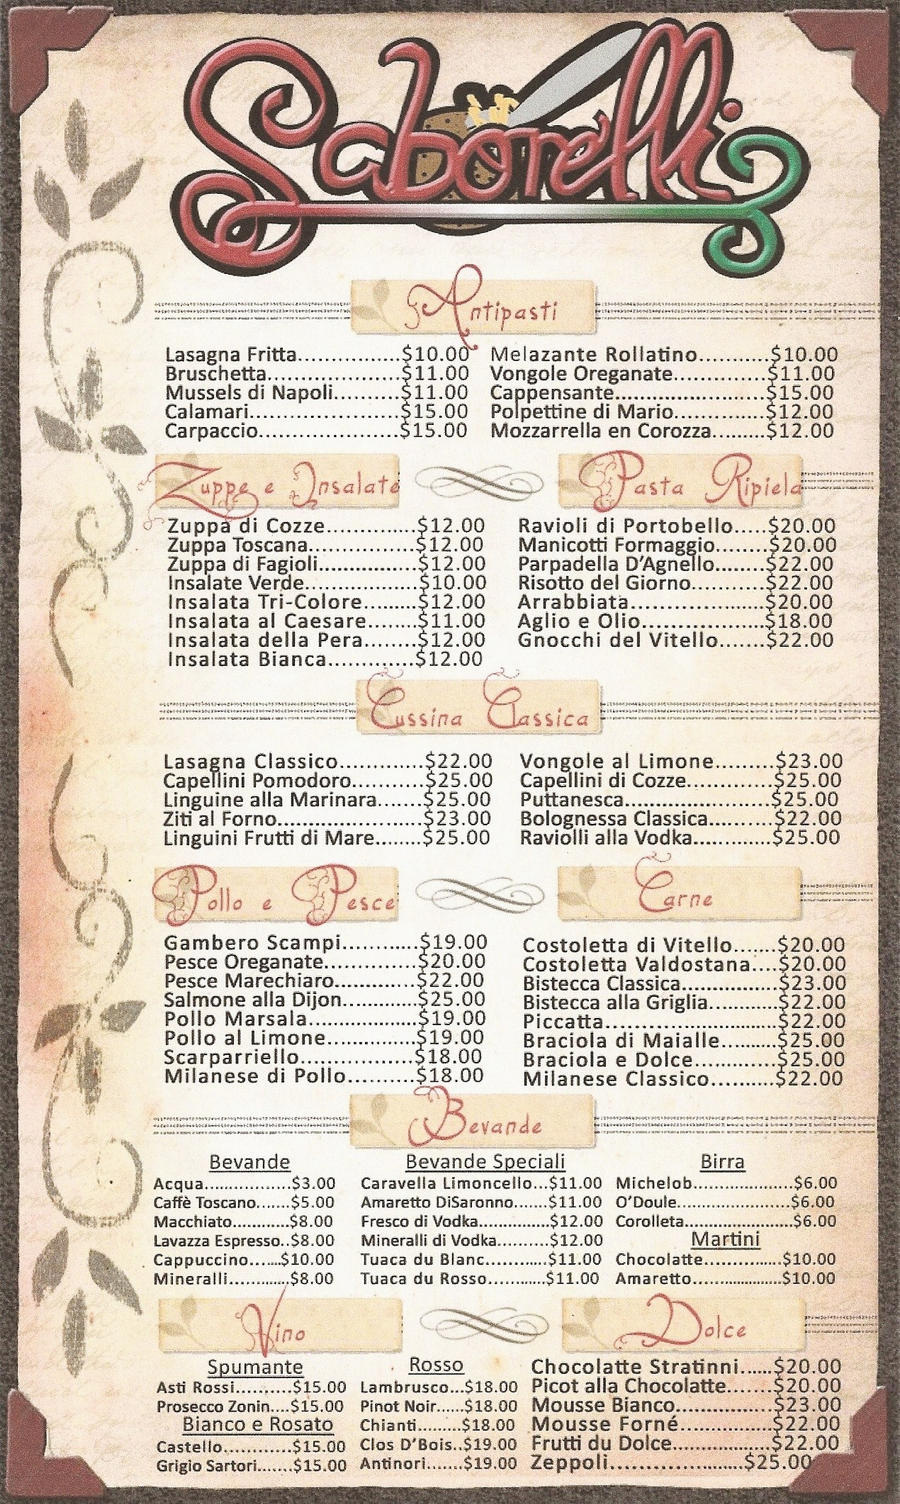 menu templates design